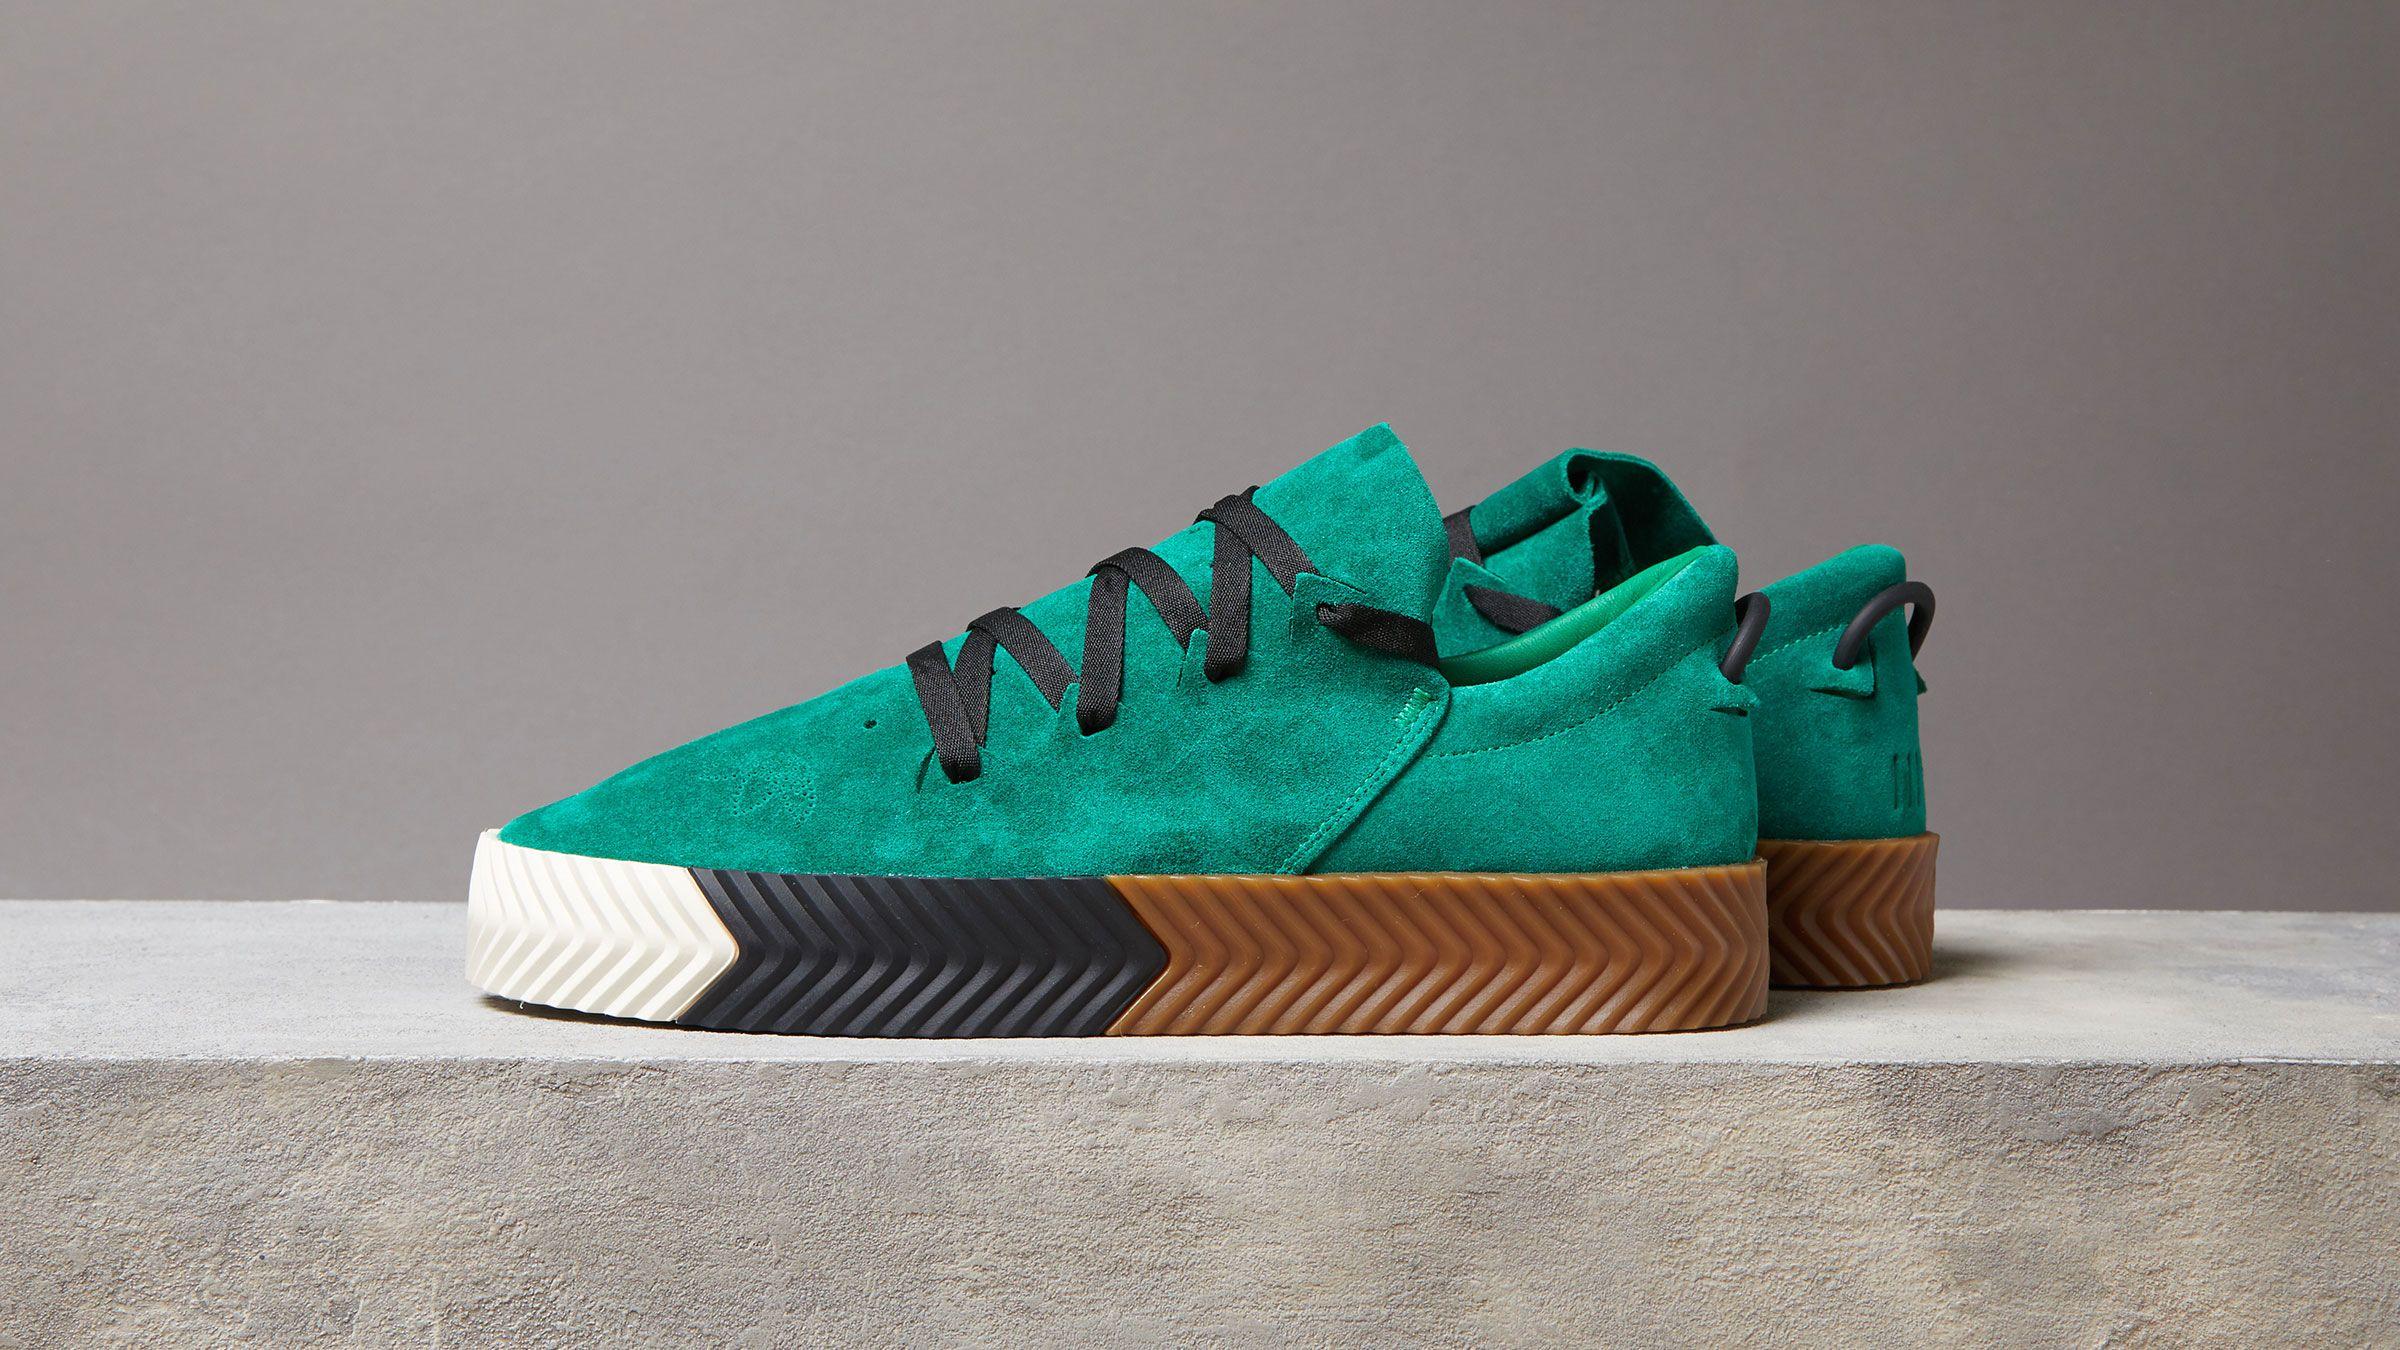 size 40 5f7f8 83f25 Adidas x Alexander Wang Skate Green Adidas Inside Sneakers